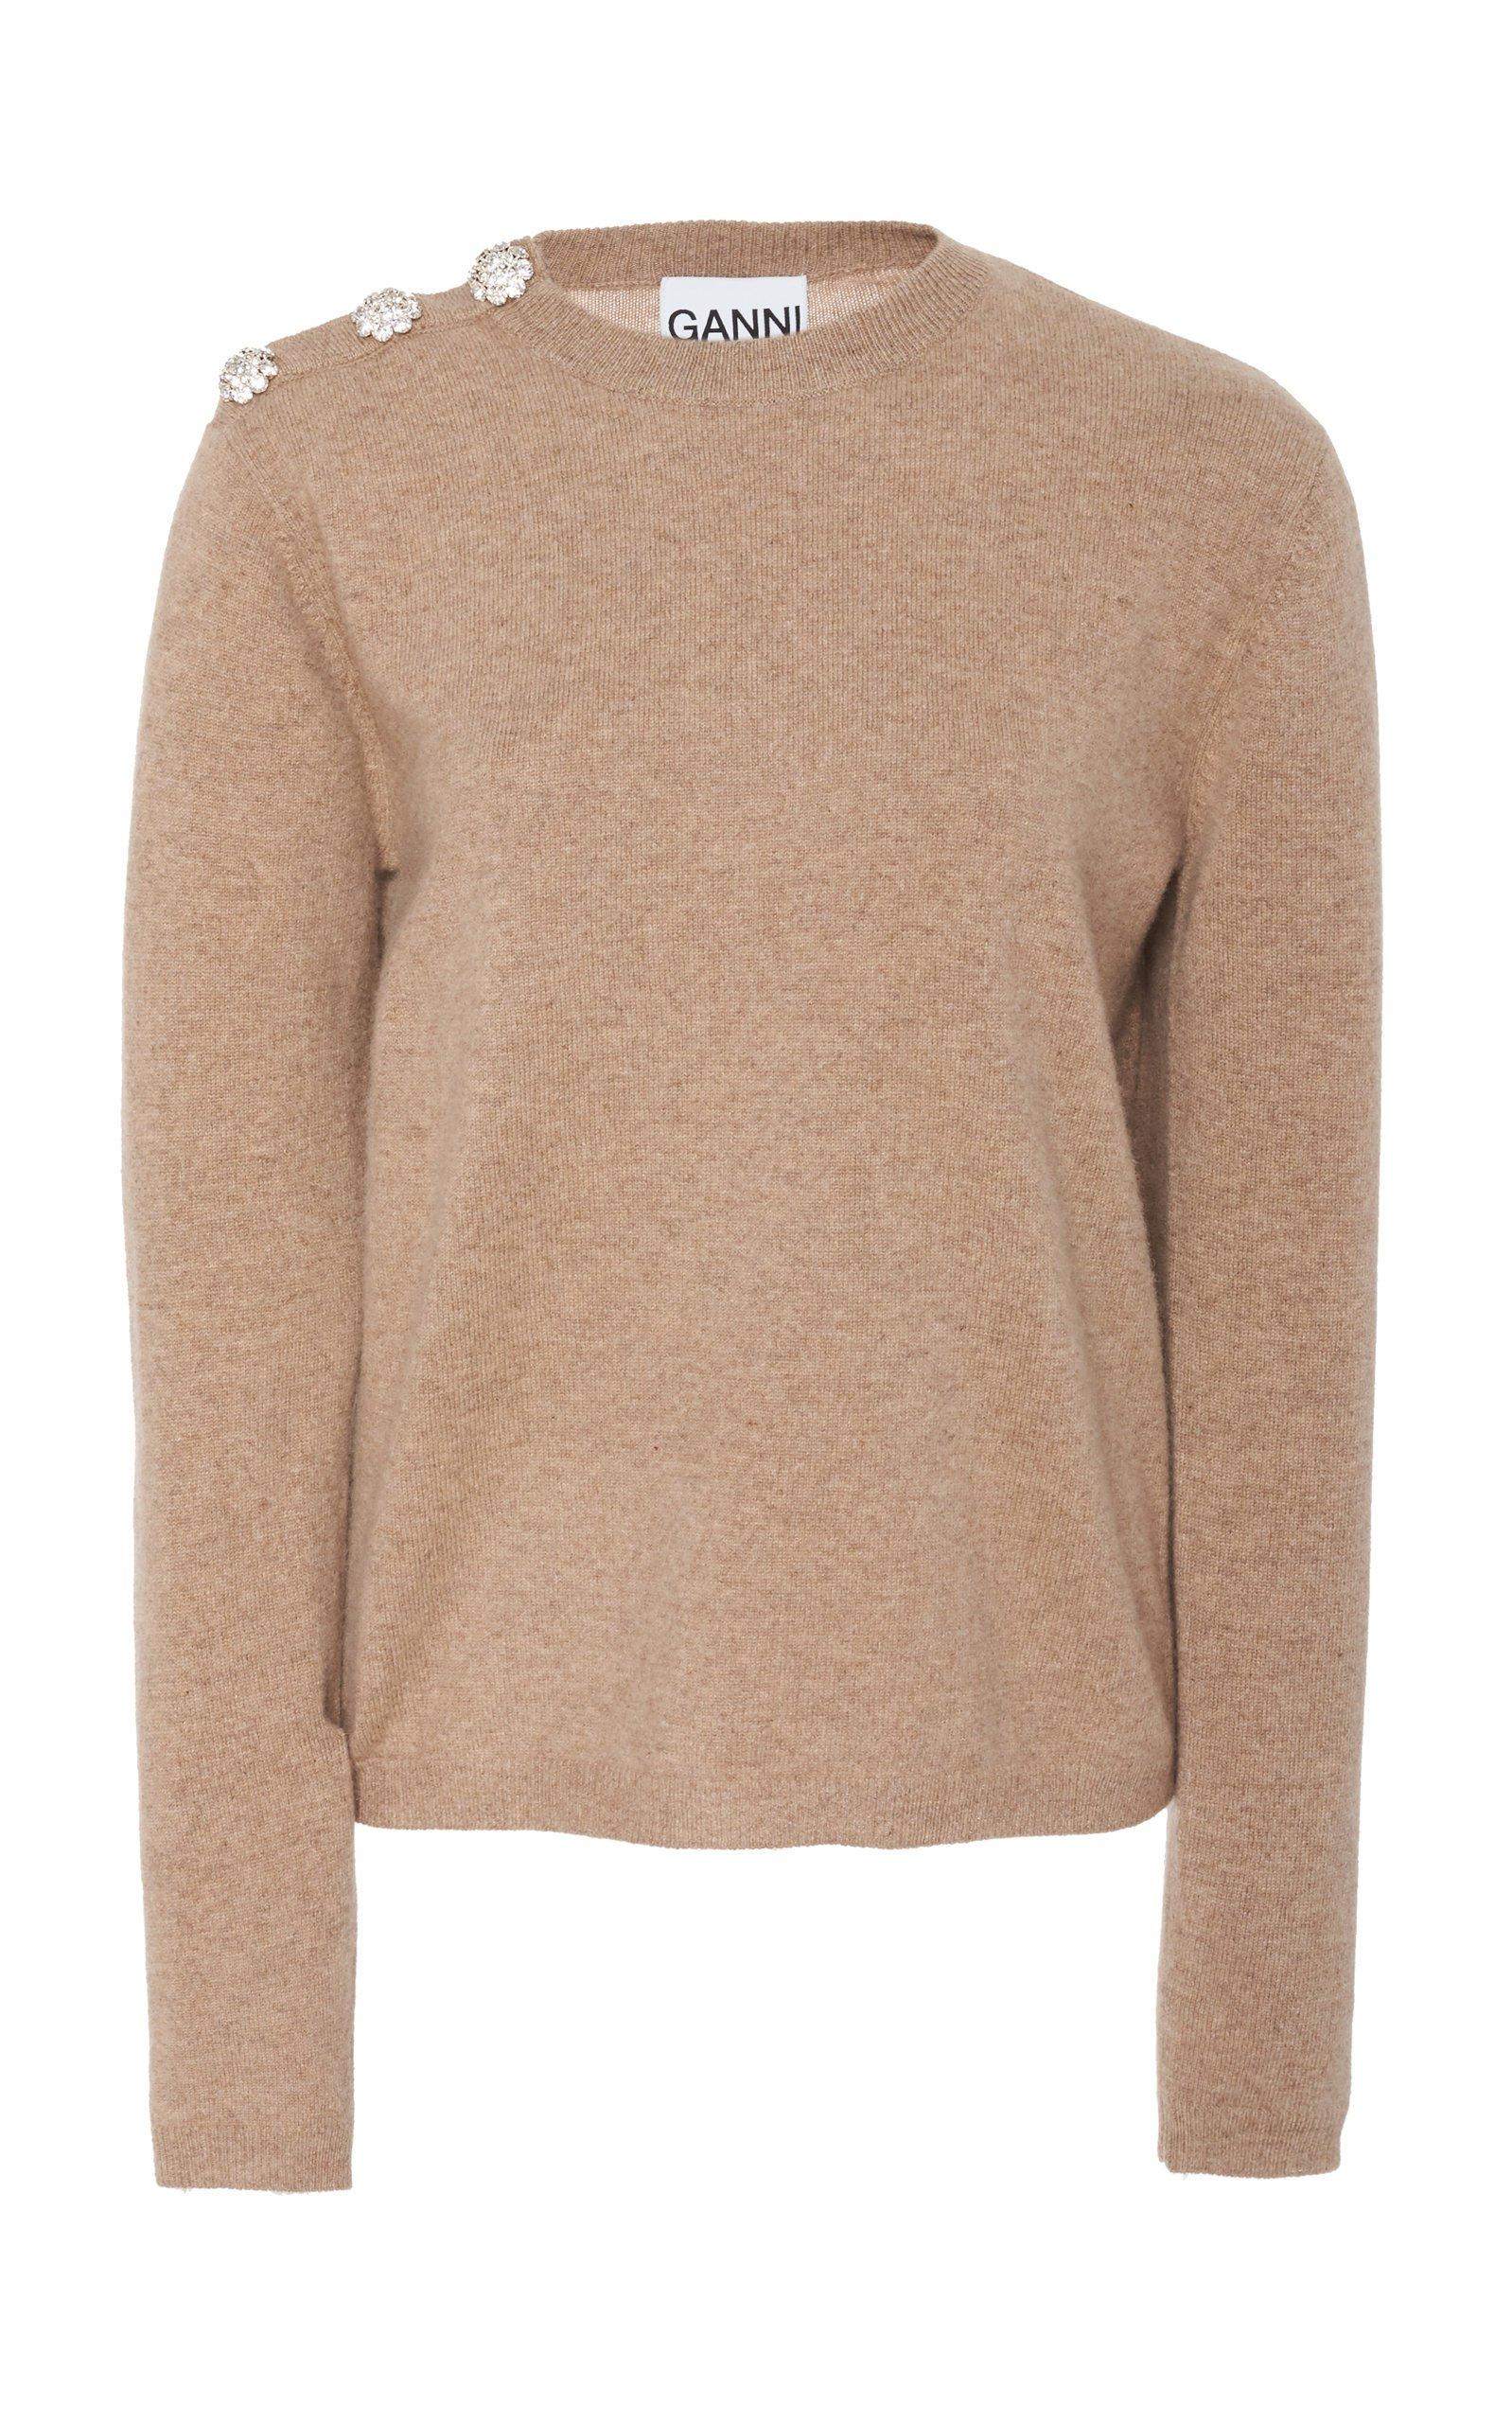 Ganni Button-Trim Cashmere Sweater